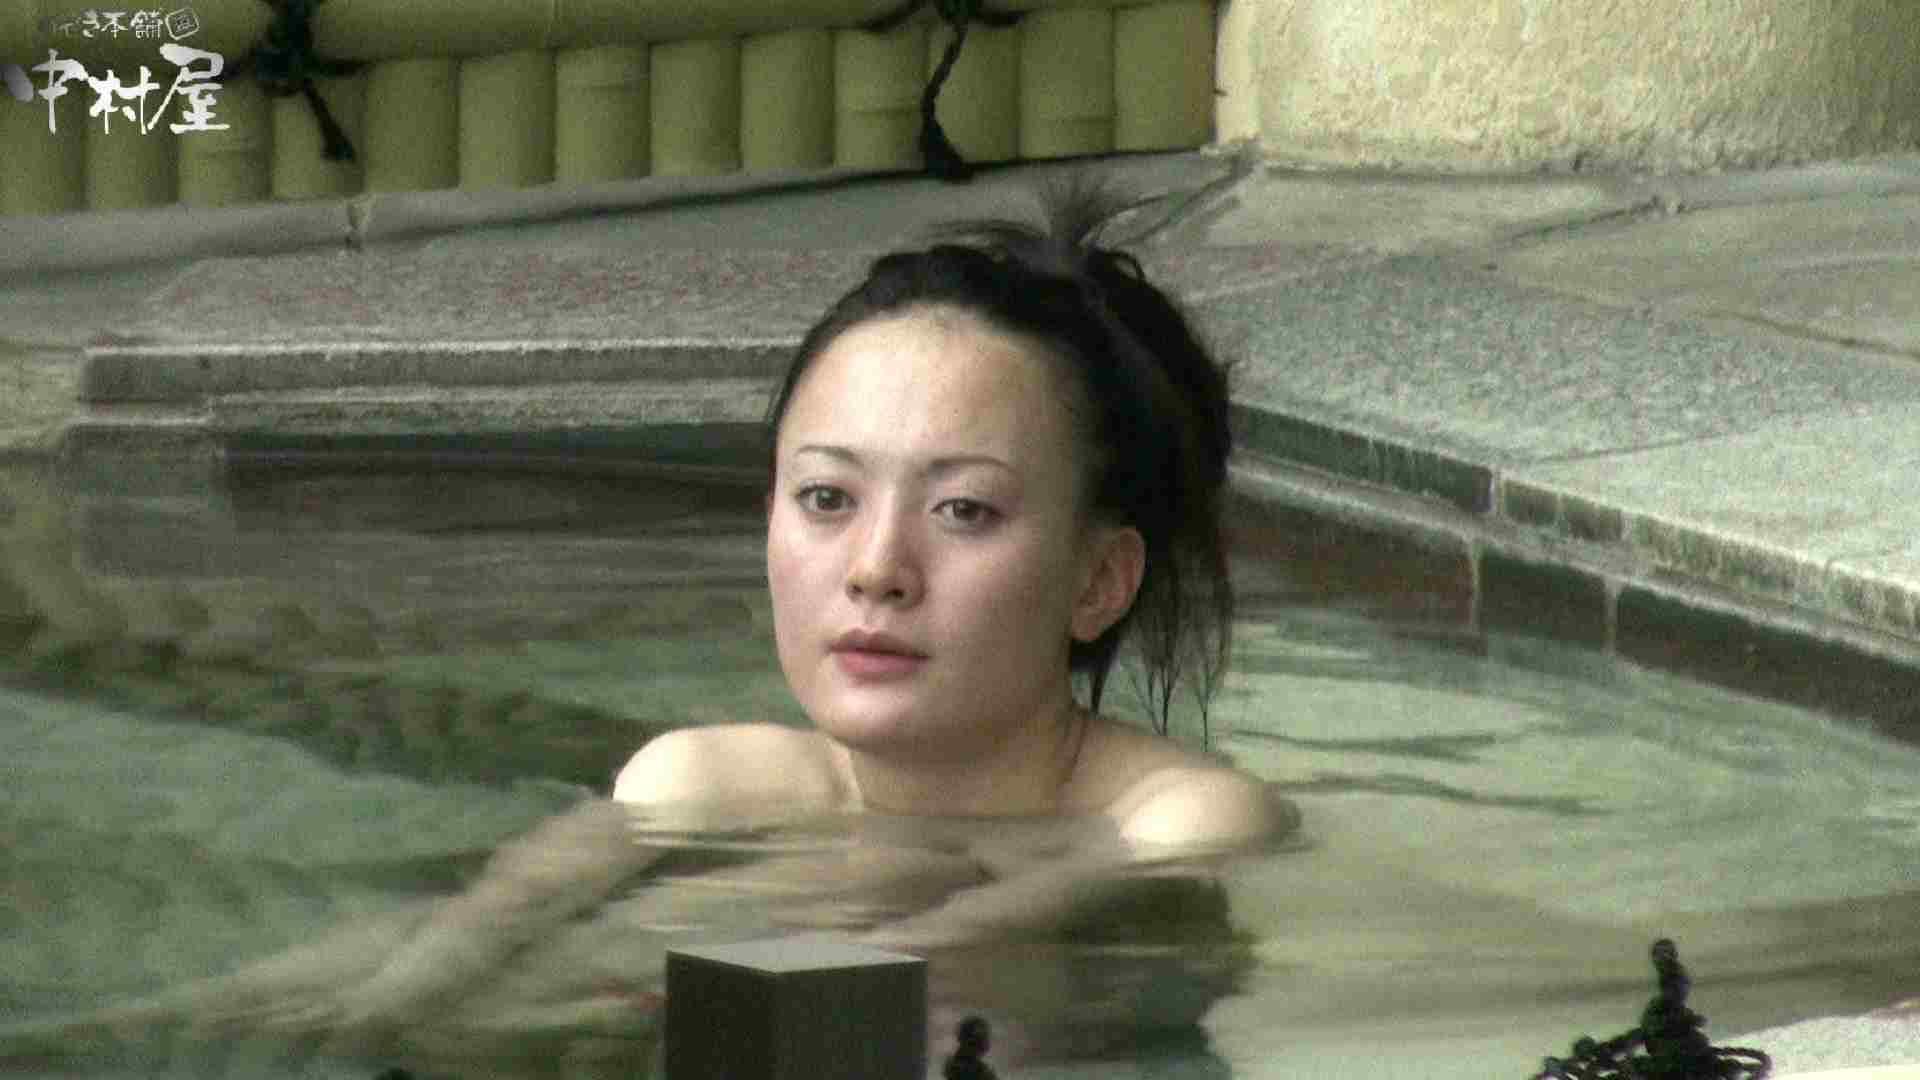 Aquaな露天風呂Vol.900 OLのエロ生活 すけべAV動画紹介 88連発 53